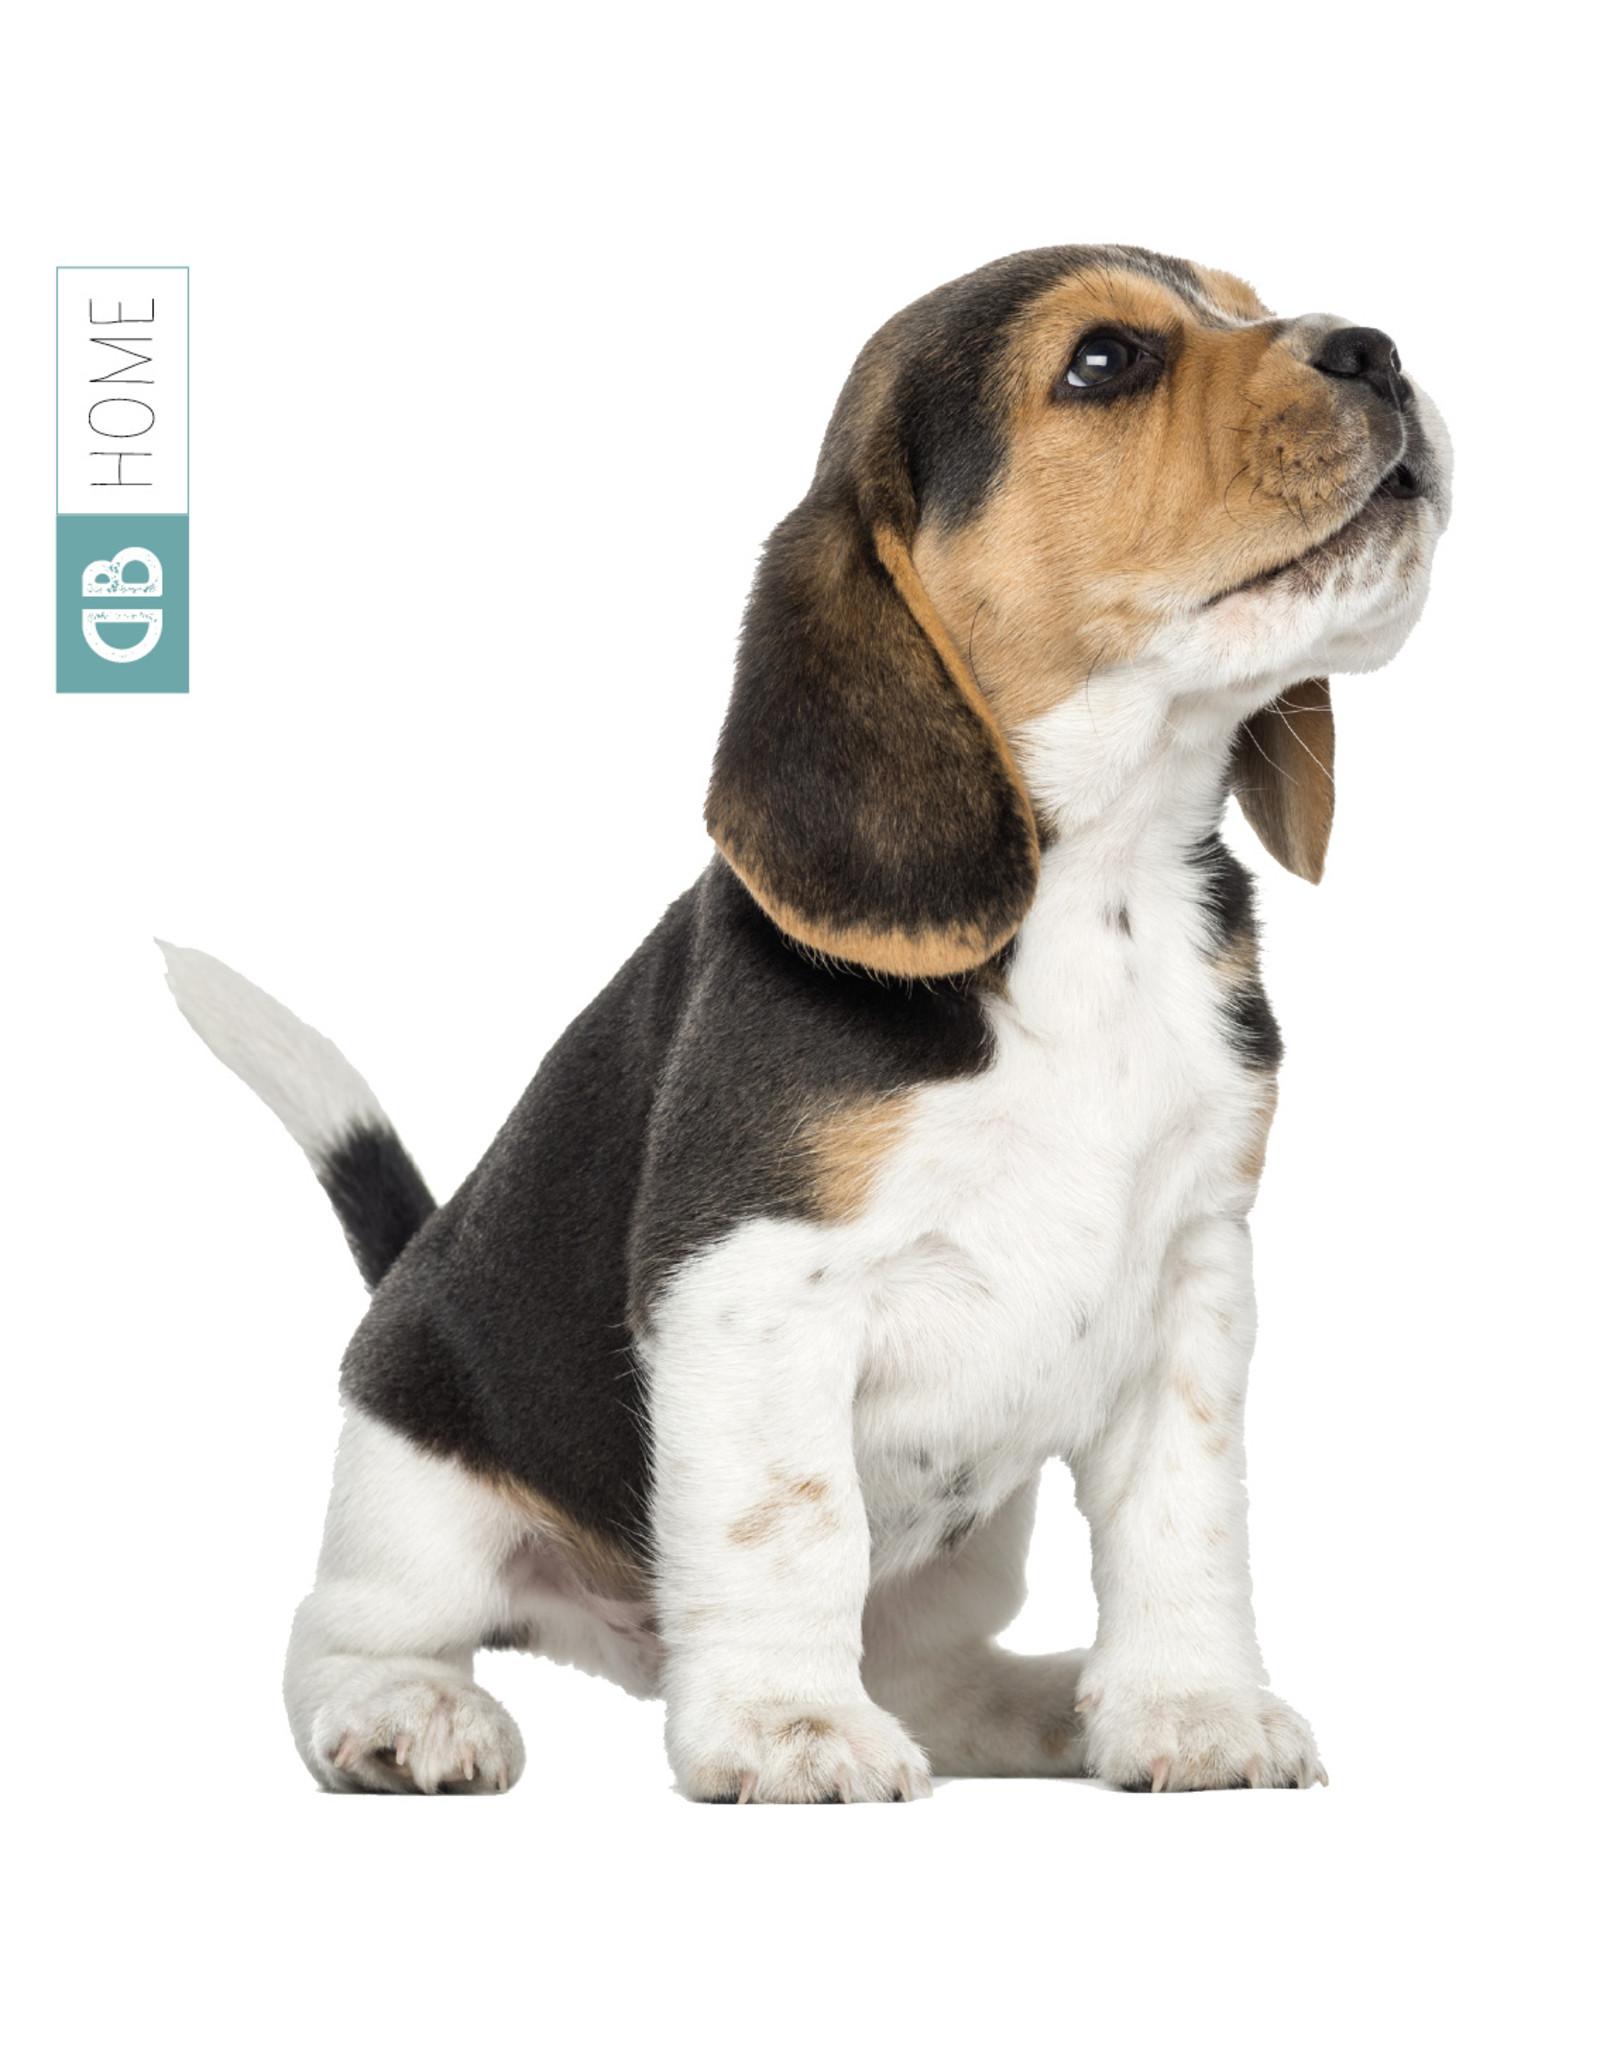 Dunnebier Home Muursticker Beagle pup - verwijderbaar